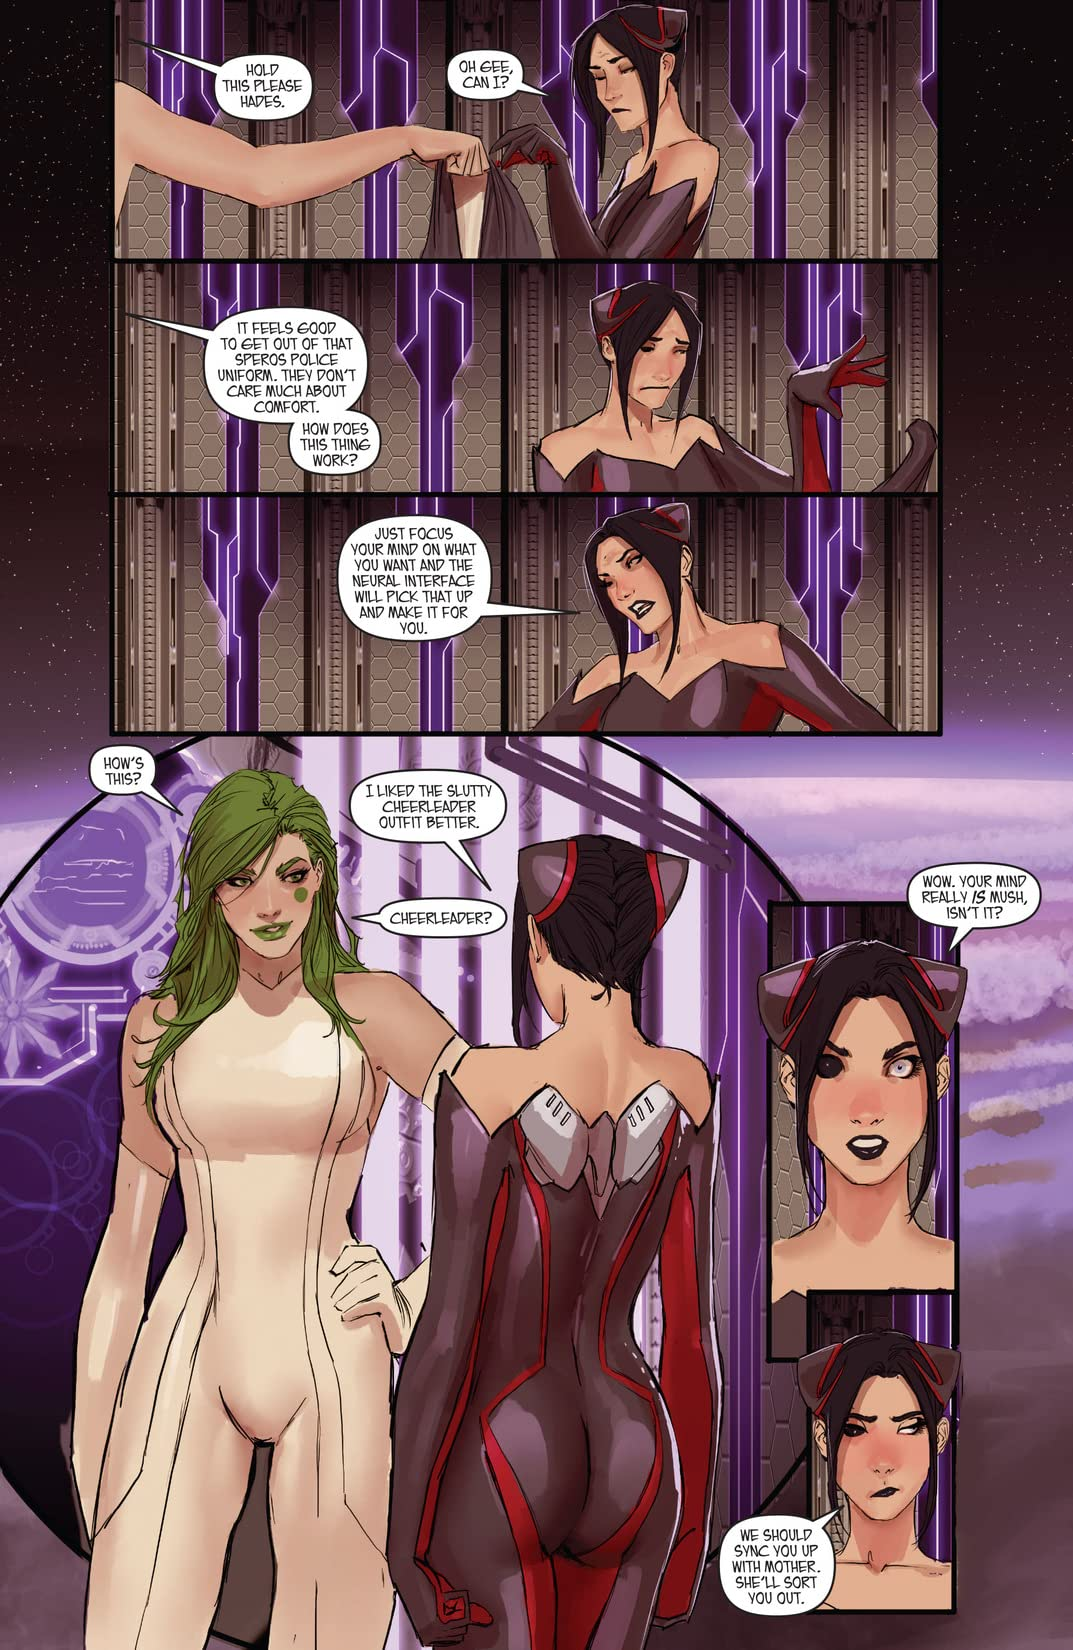 Aphrodite IX Vol. 2 #11